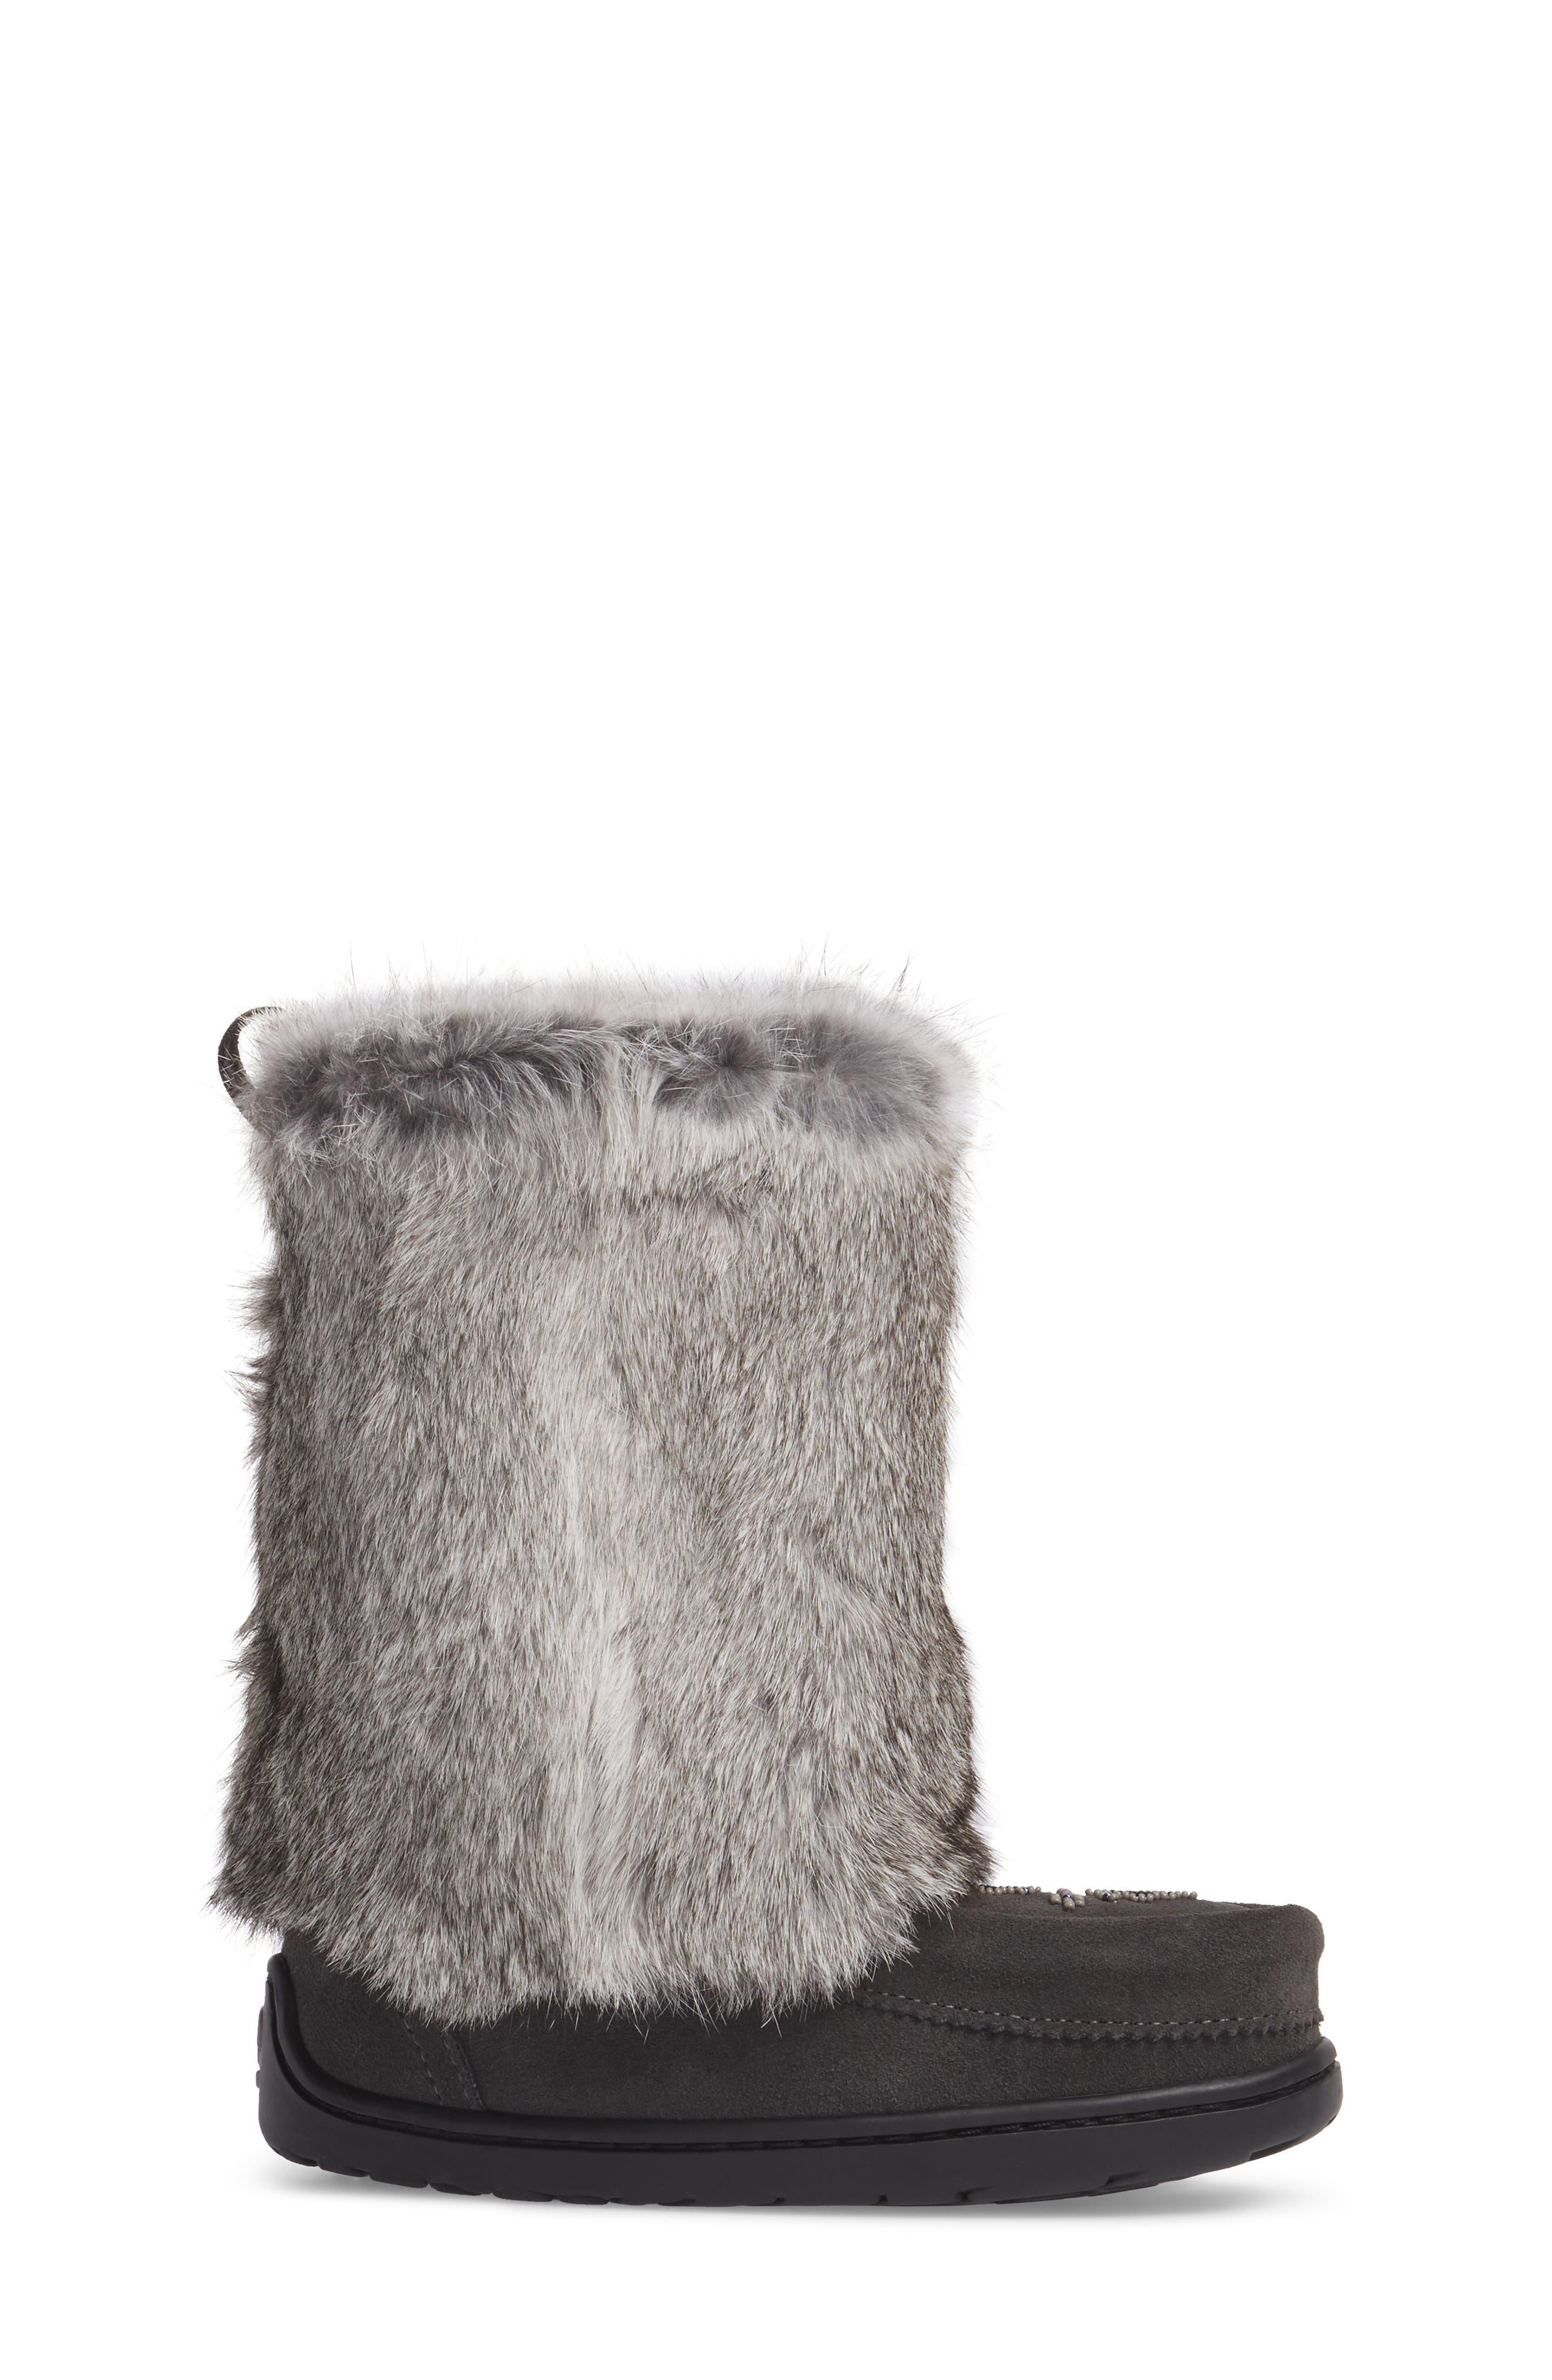 Nordic Genuine Rabbit Fur & Genuine Shearling Mukluk Boot,                             Alternate thumbnail 3, color,                             021